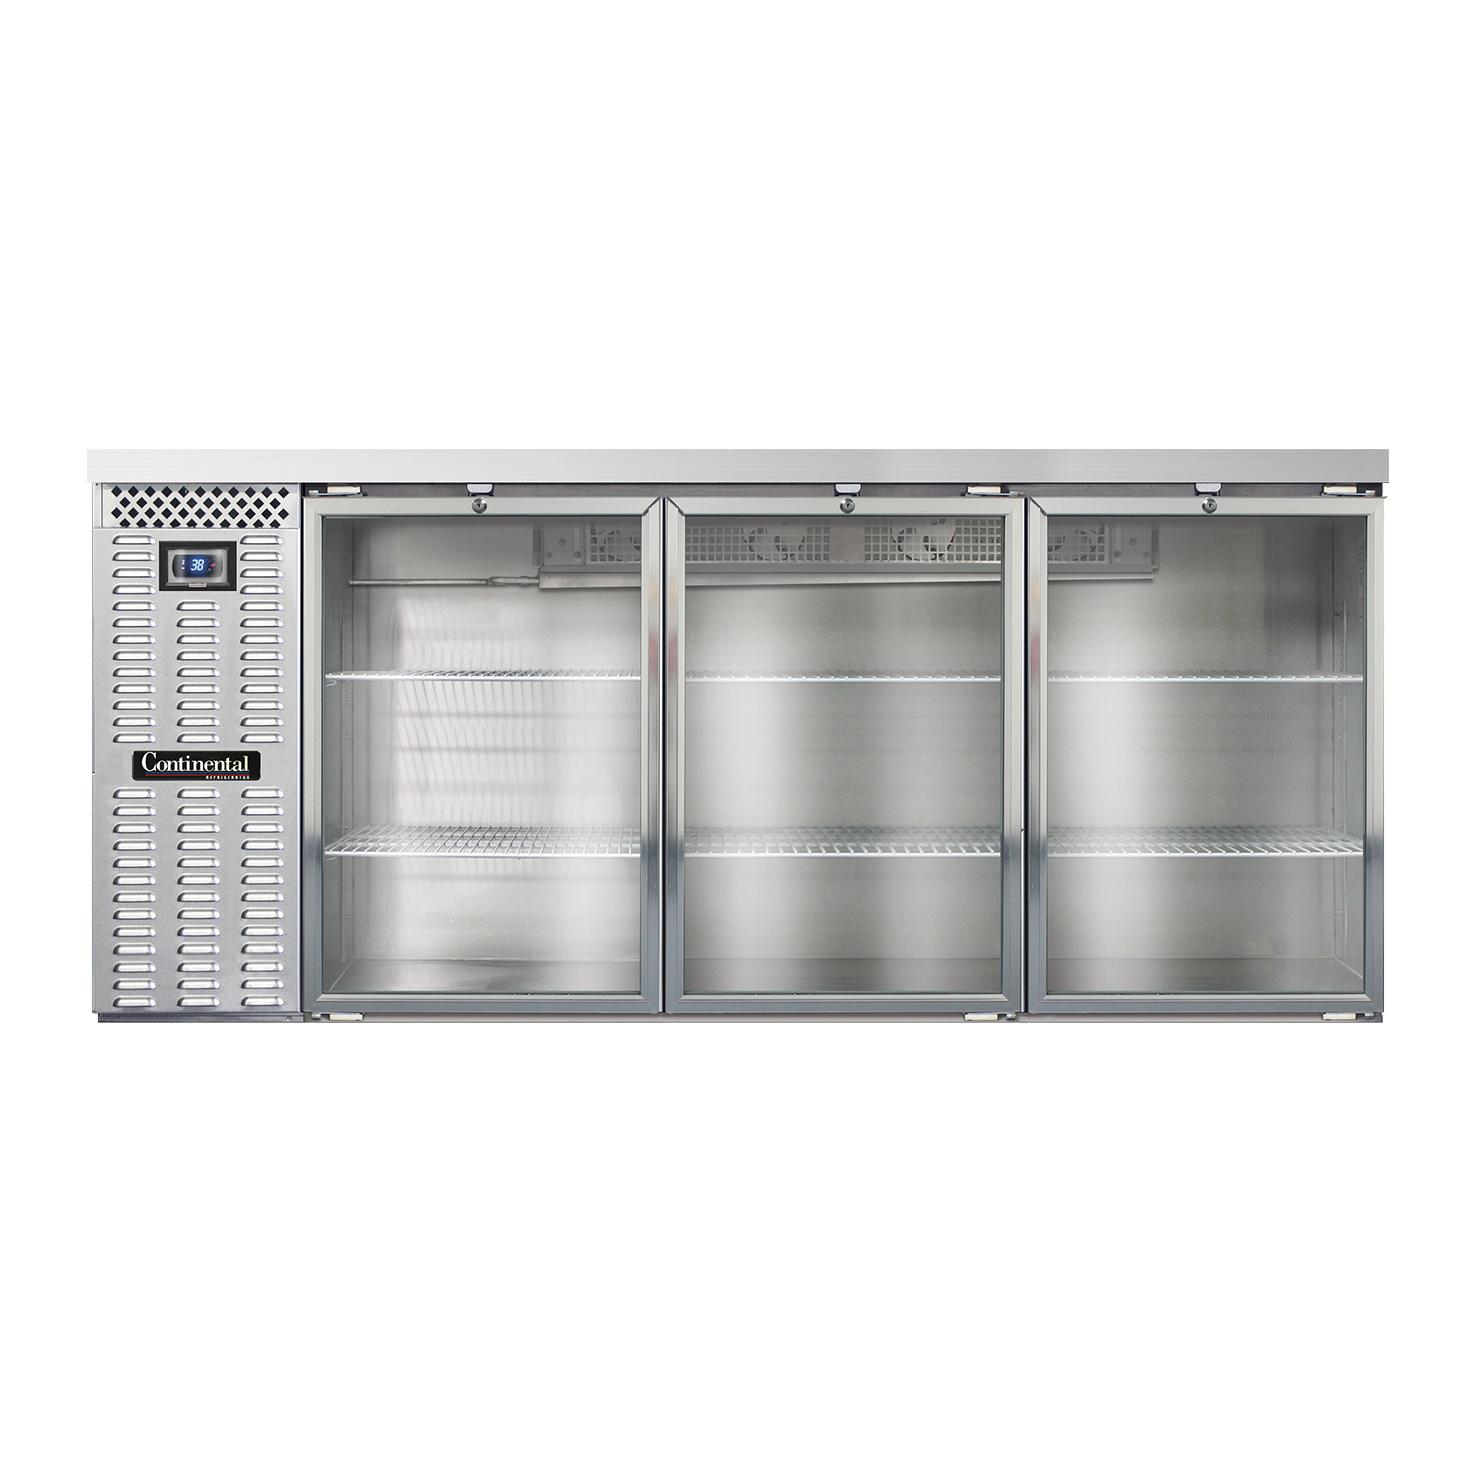 Continental Refrigerator BBC79-SS-GD back bar cabinet, refrigerated